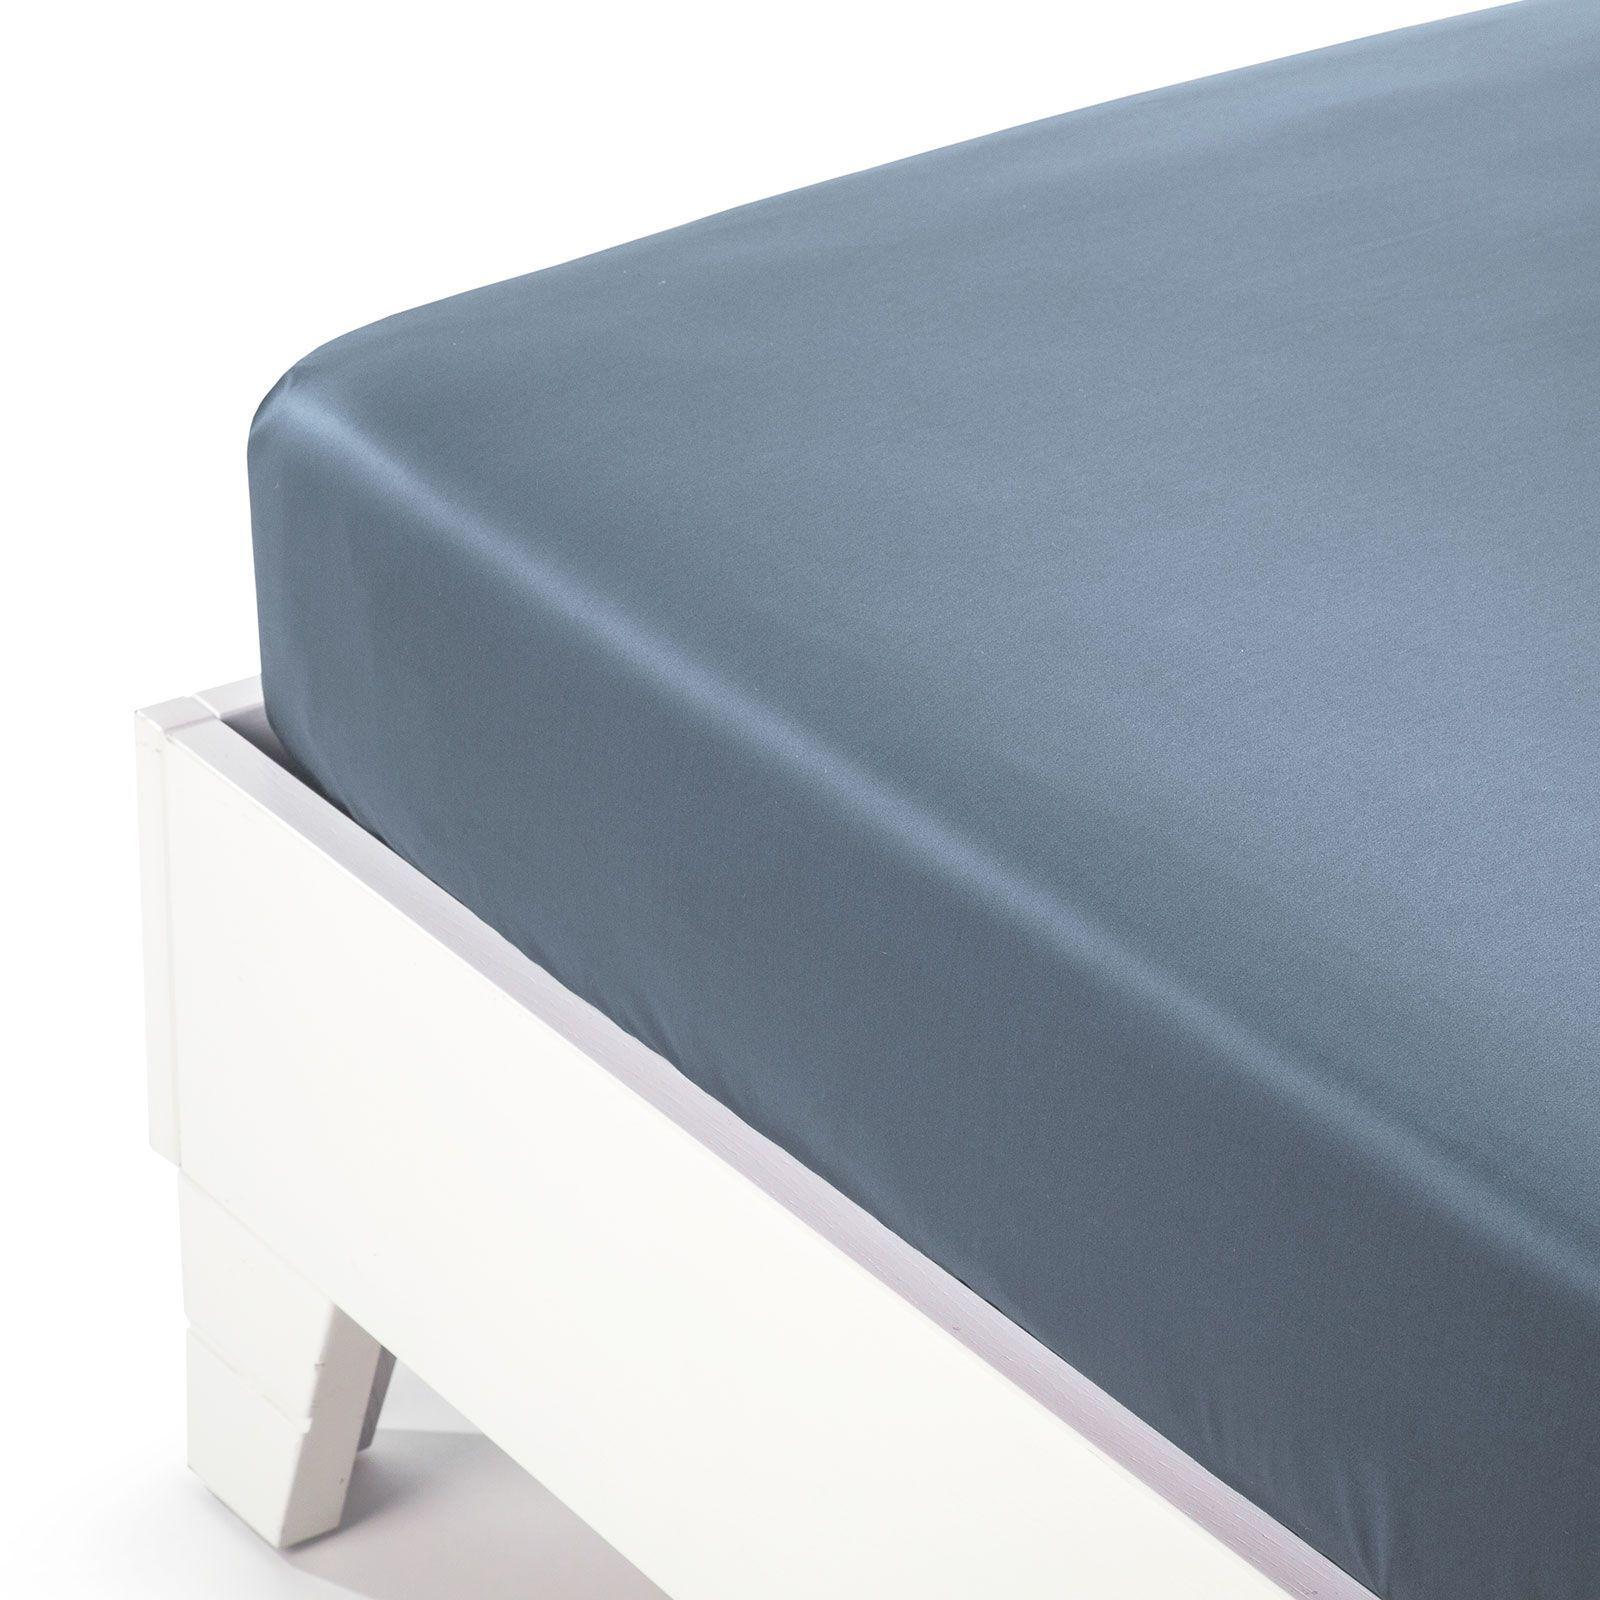 Простыни на резинке Простыня на резинке 200x200 Сaleffi Raso Tinta Unito с бордюром сатин синяя prostynya-na-rezinke-160x200-saleffi-raso-tinta-unito-s-bordyurom-satin-avio-italiya.jpg